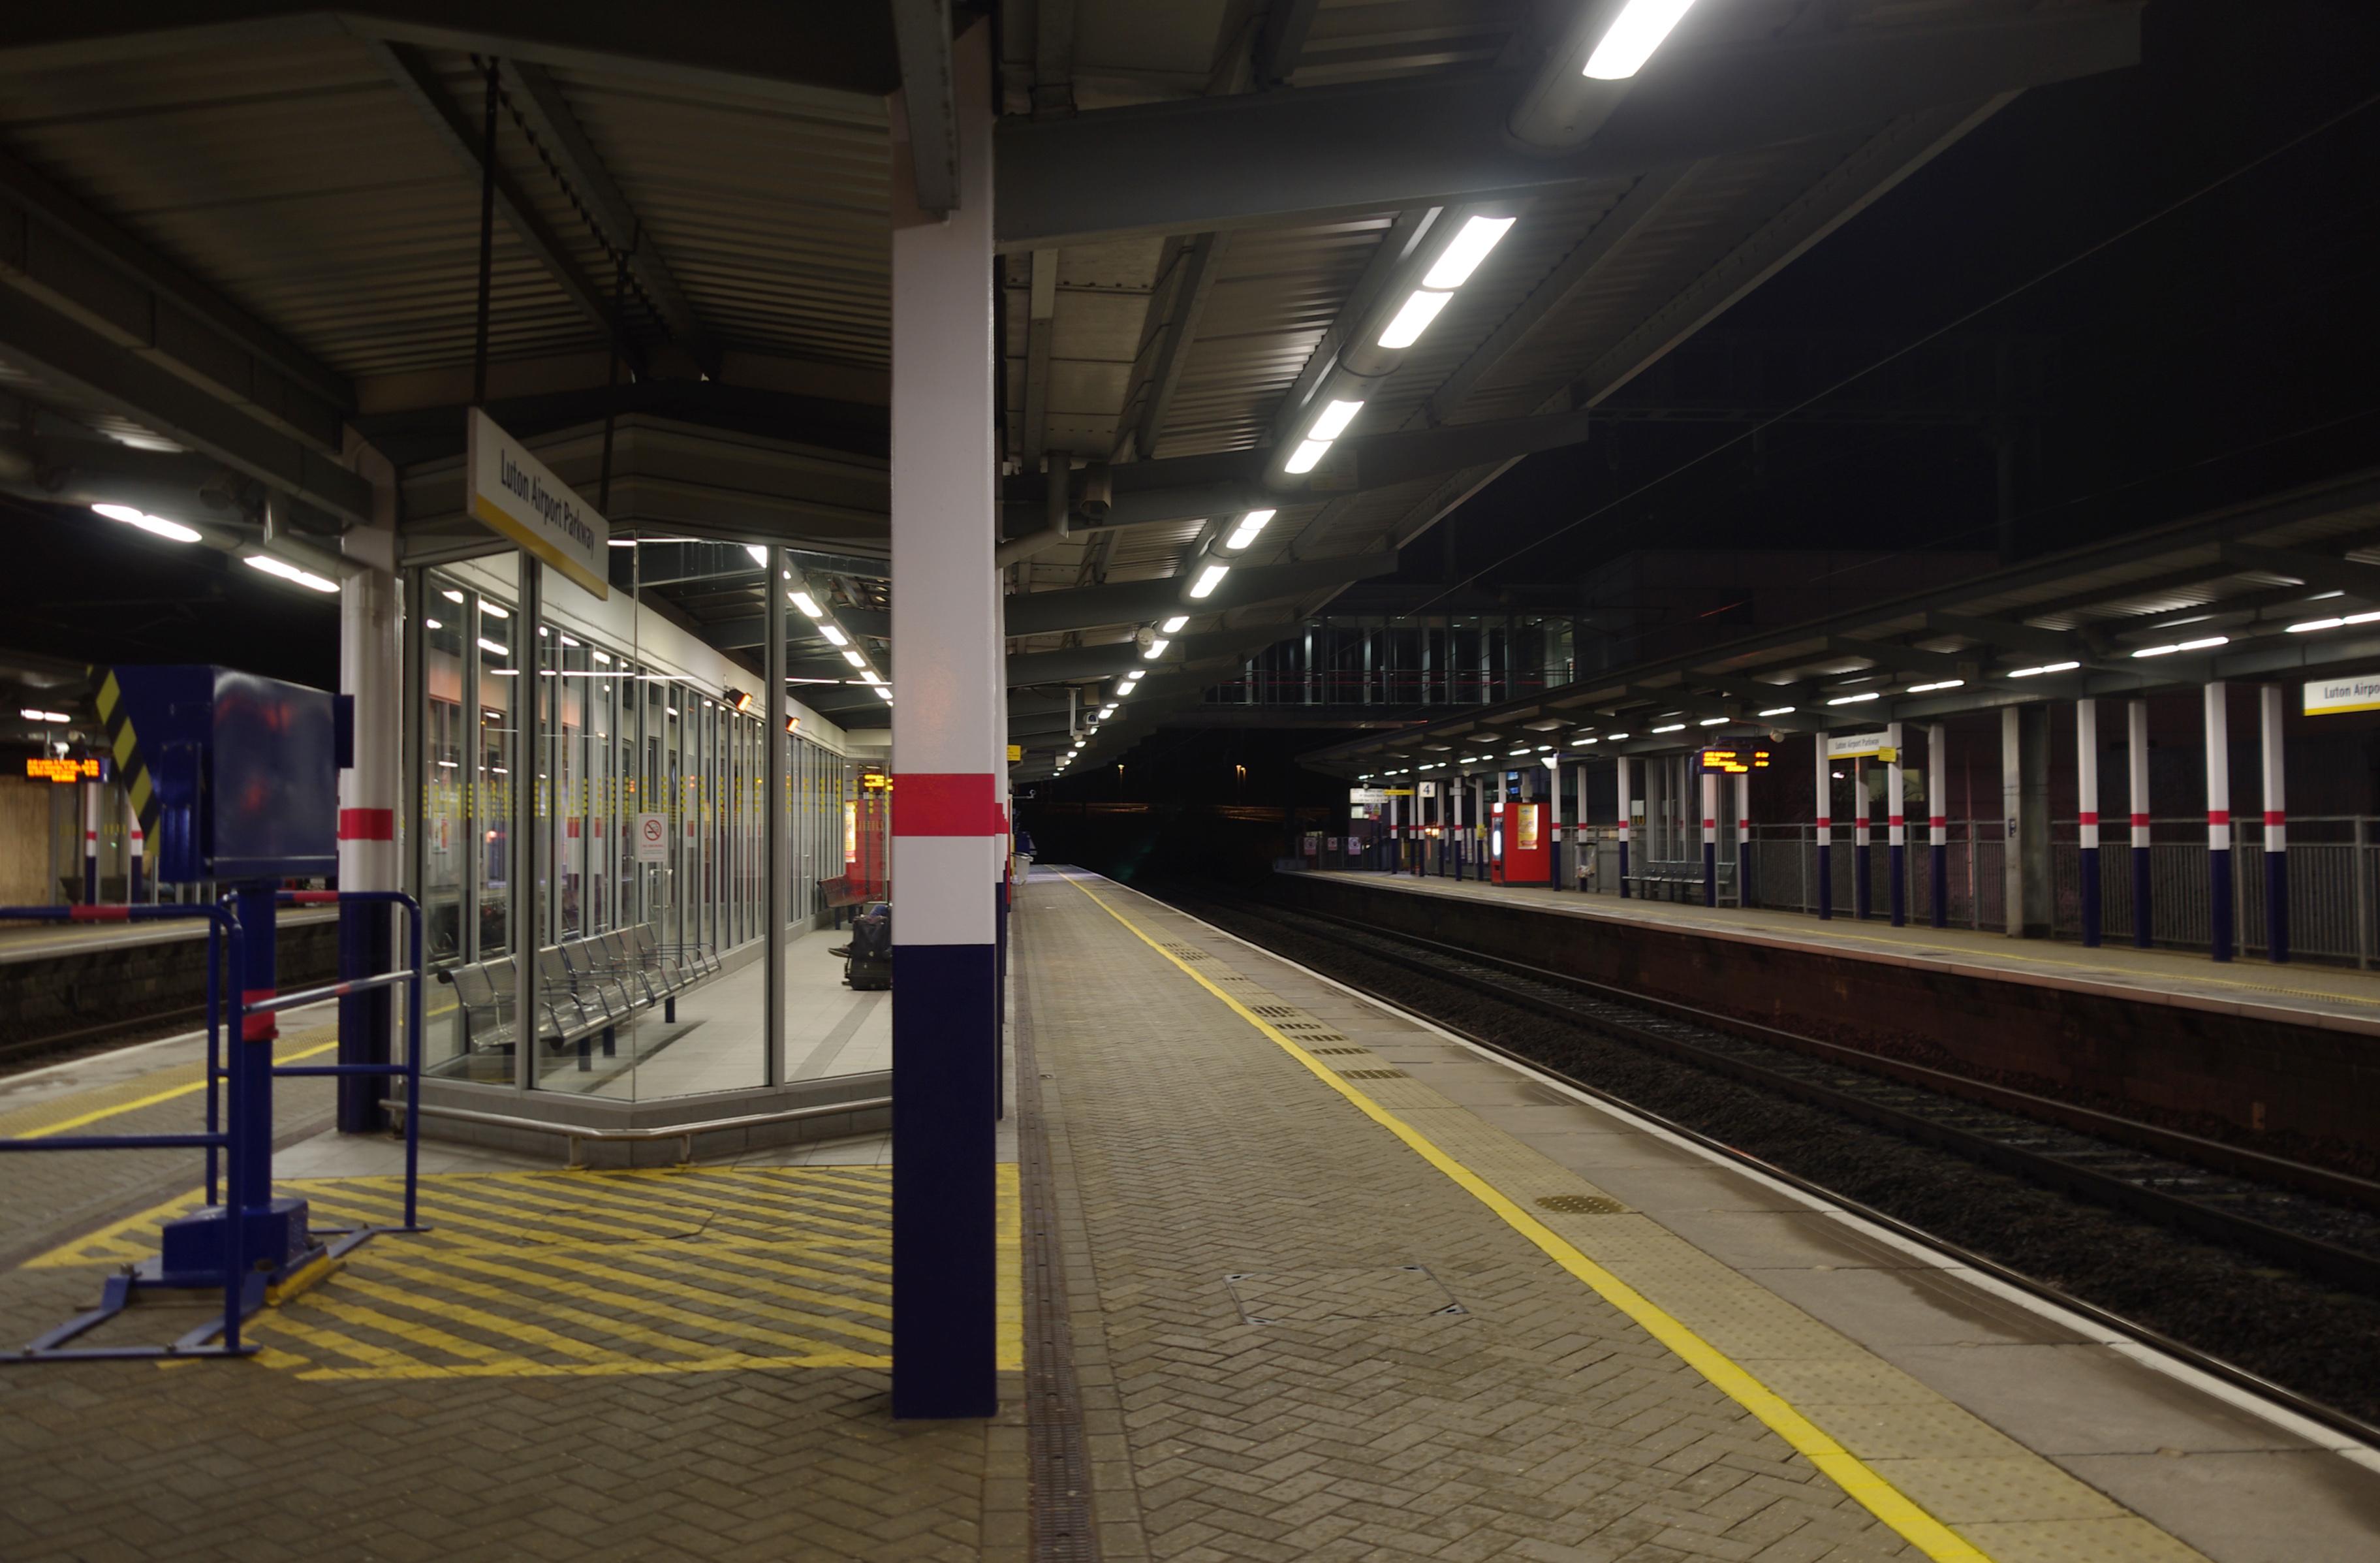 Luton train station